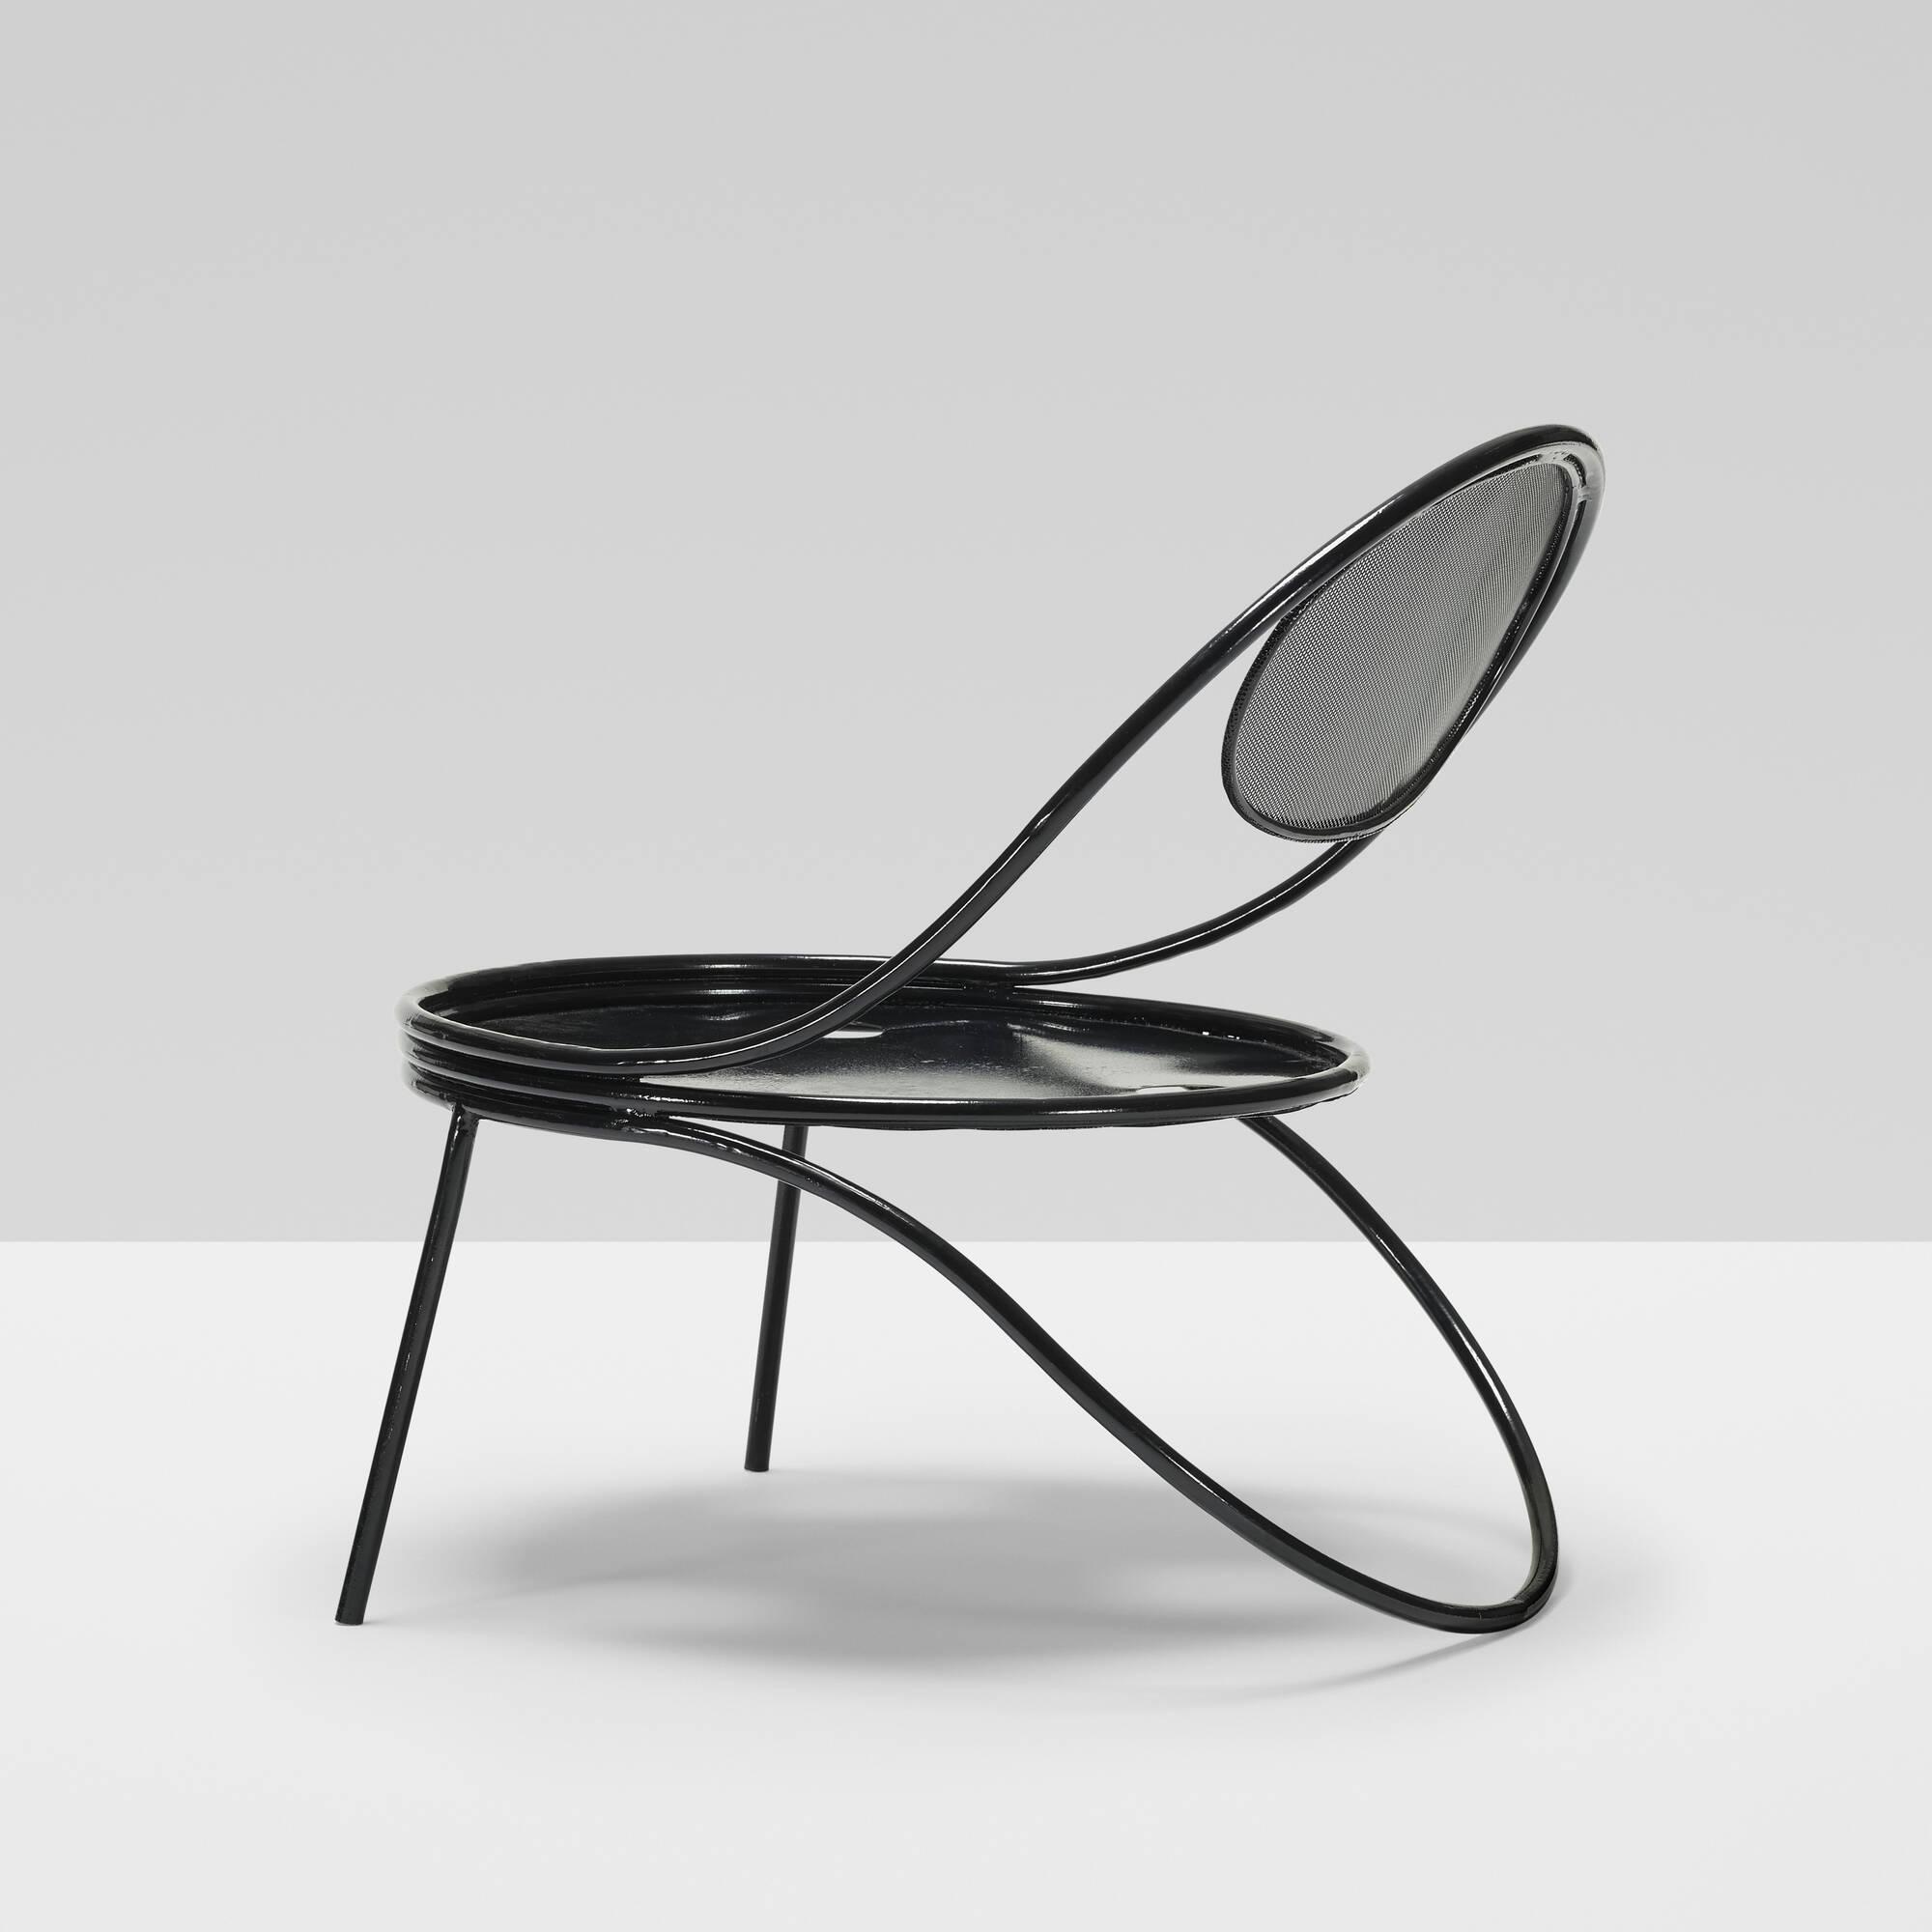 118: Mathieu Matégot / Copacabana chair (1 of 1)